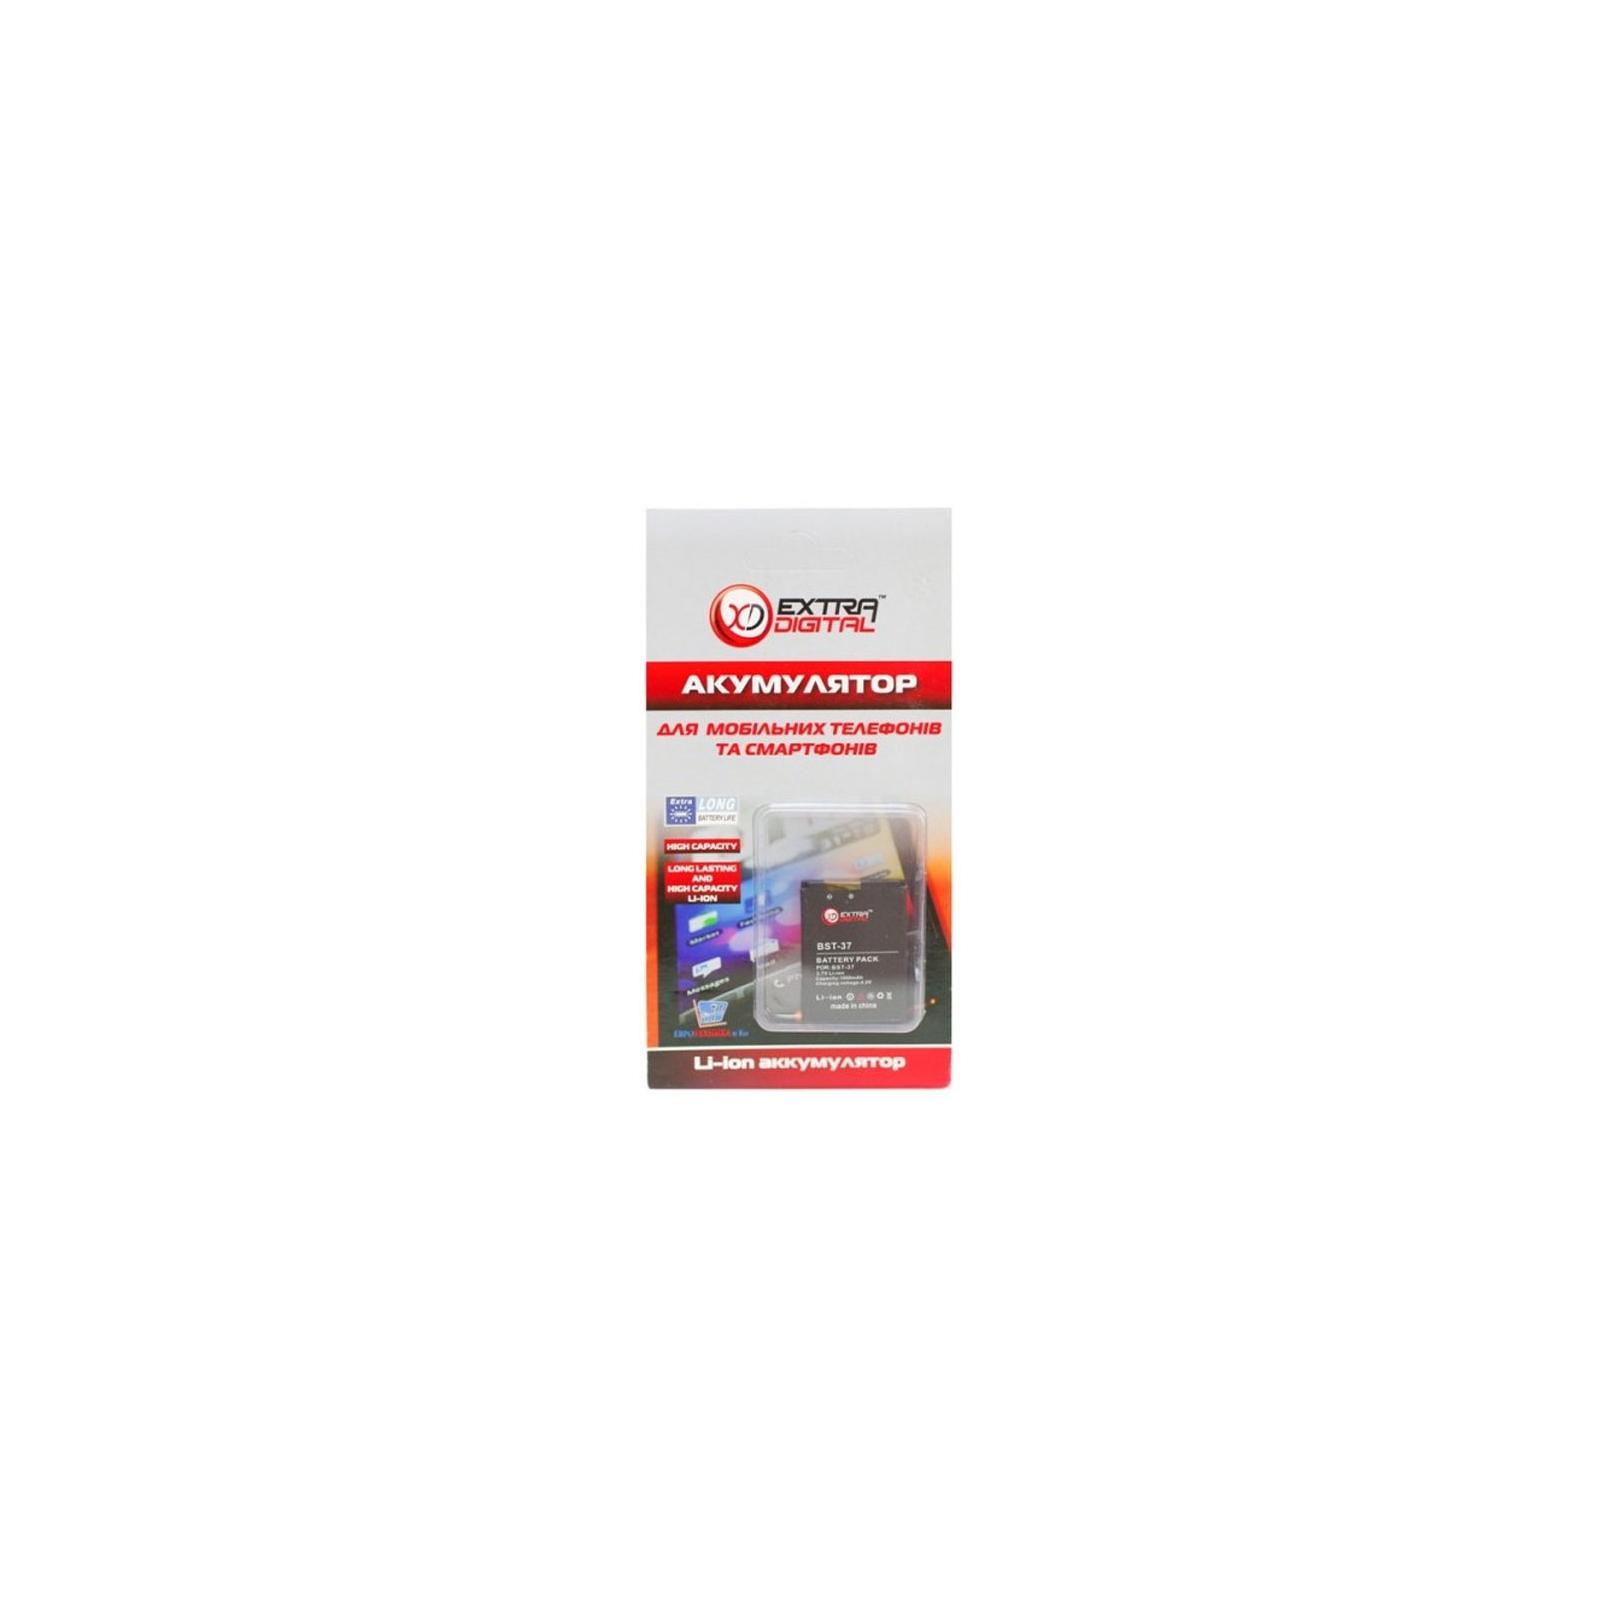 Аккумуляторная батарея EXTRADIGITAL Sony Ericsson BST-37 (1000 mAh) (BMS6351) изображение 3